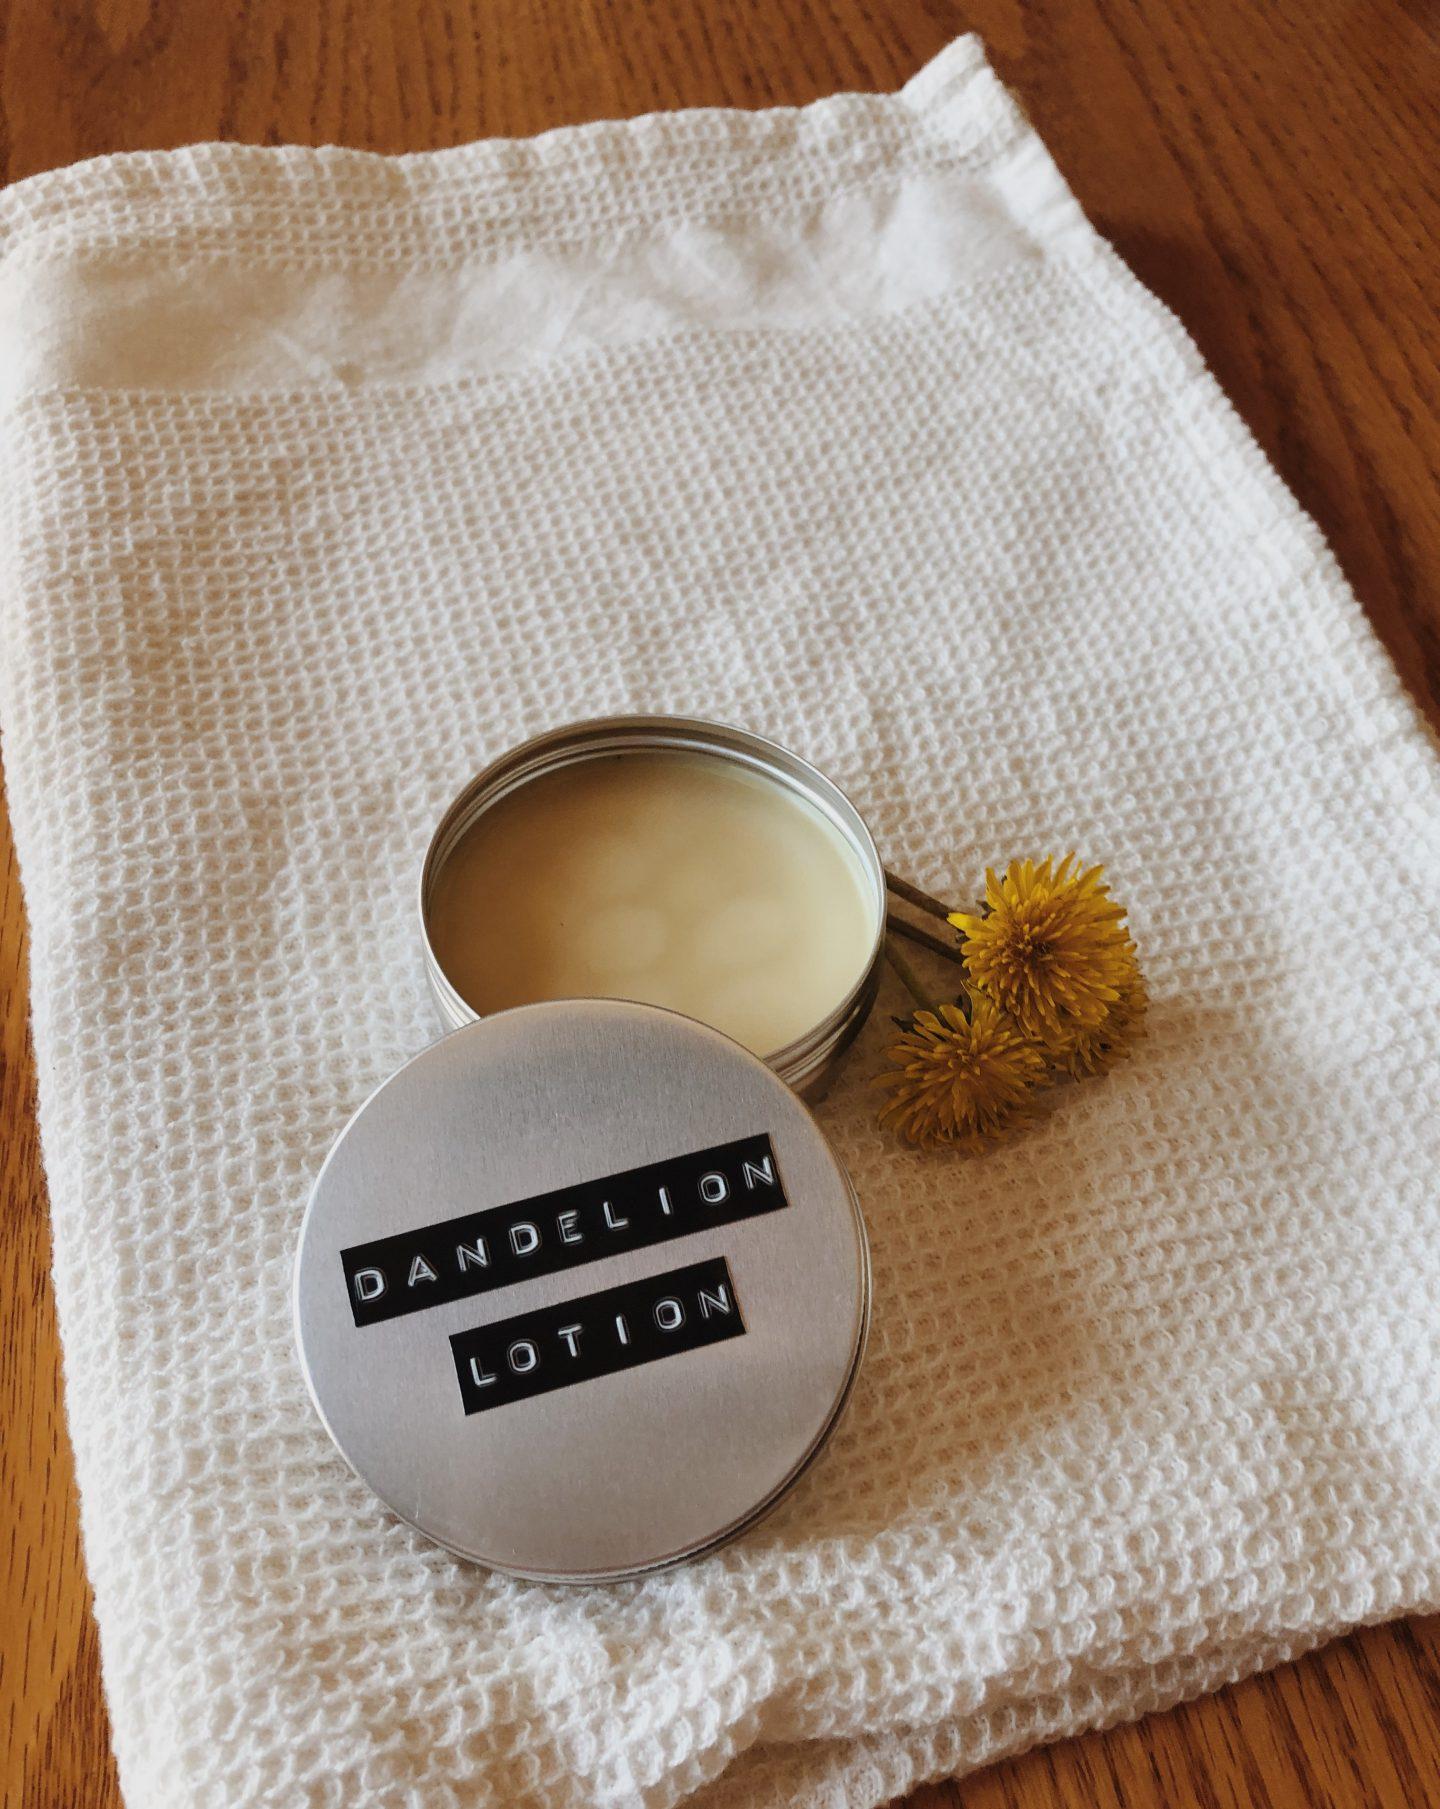 DIY dandelion lotion